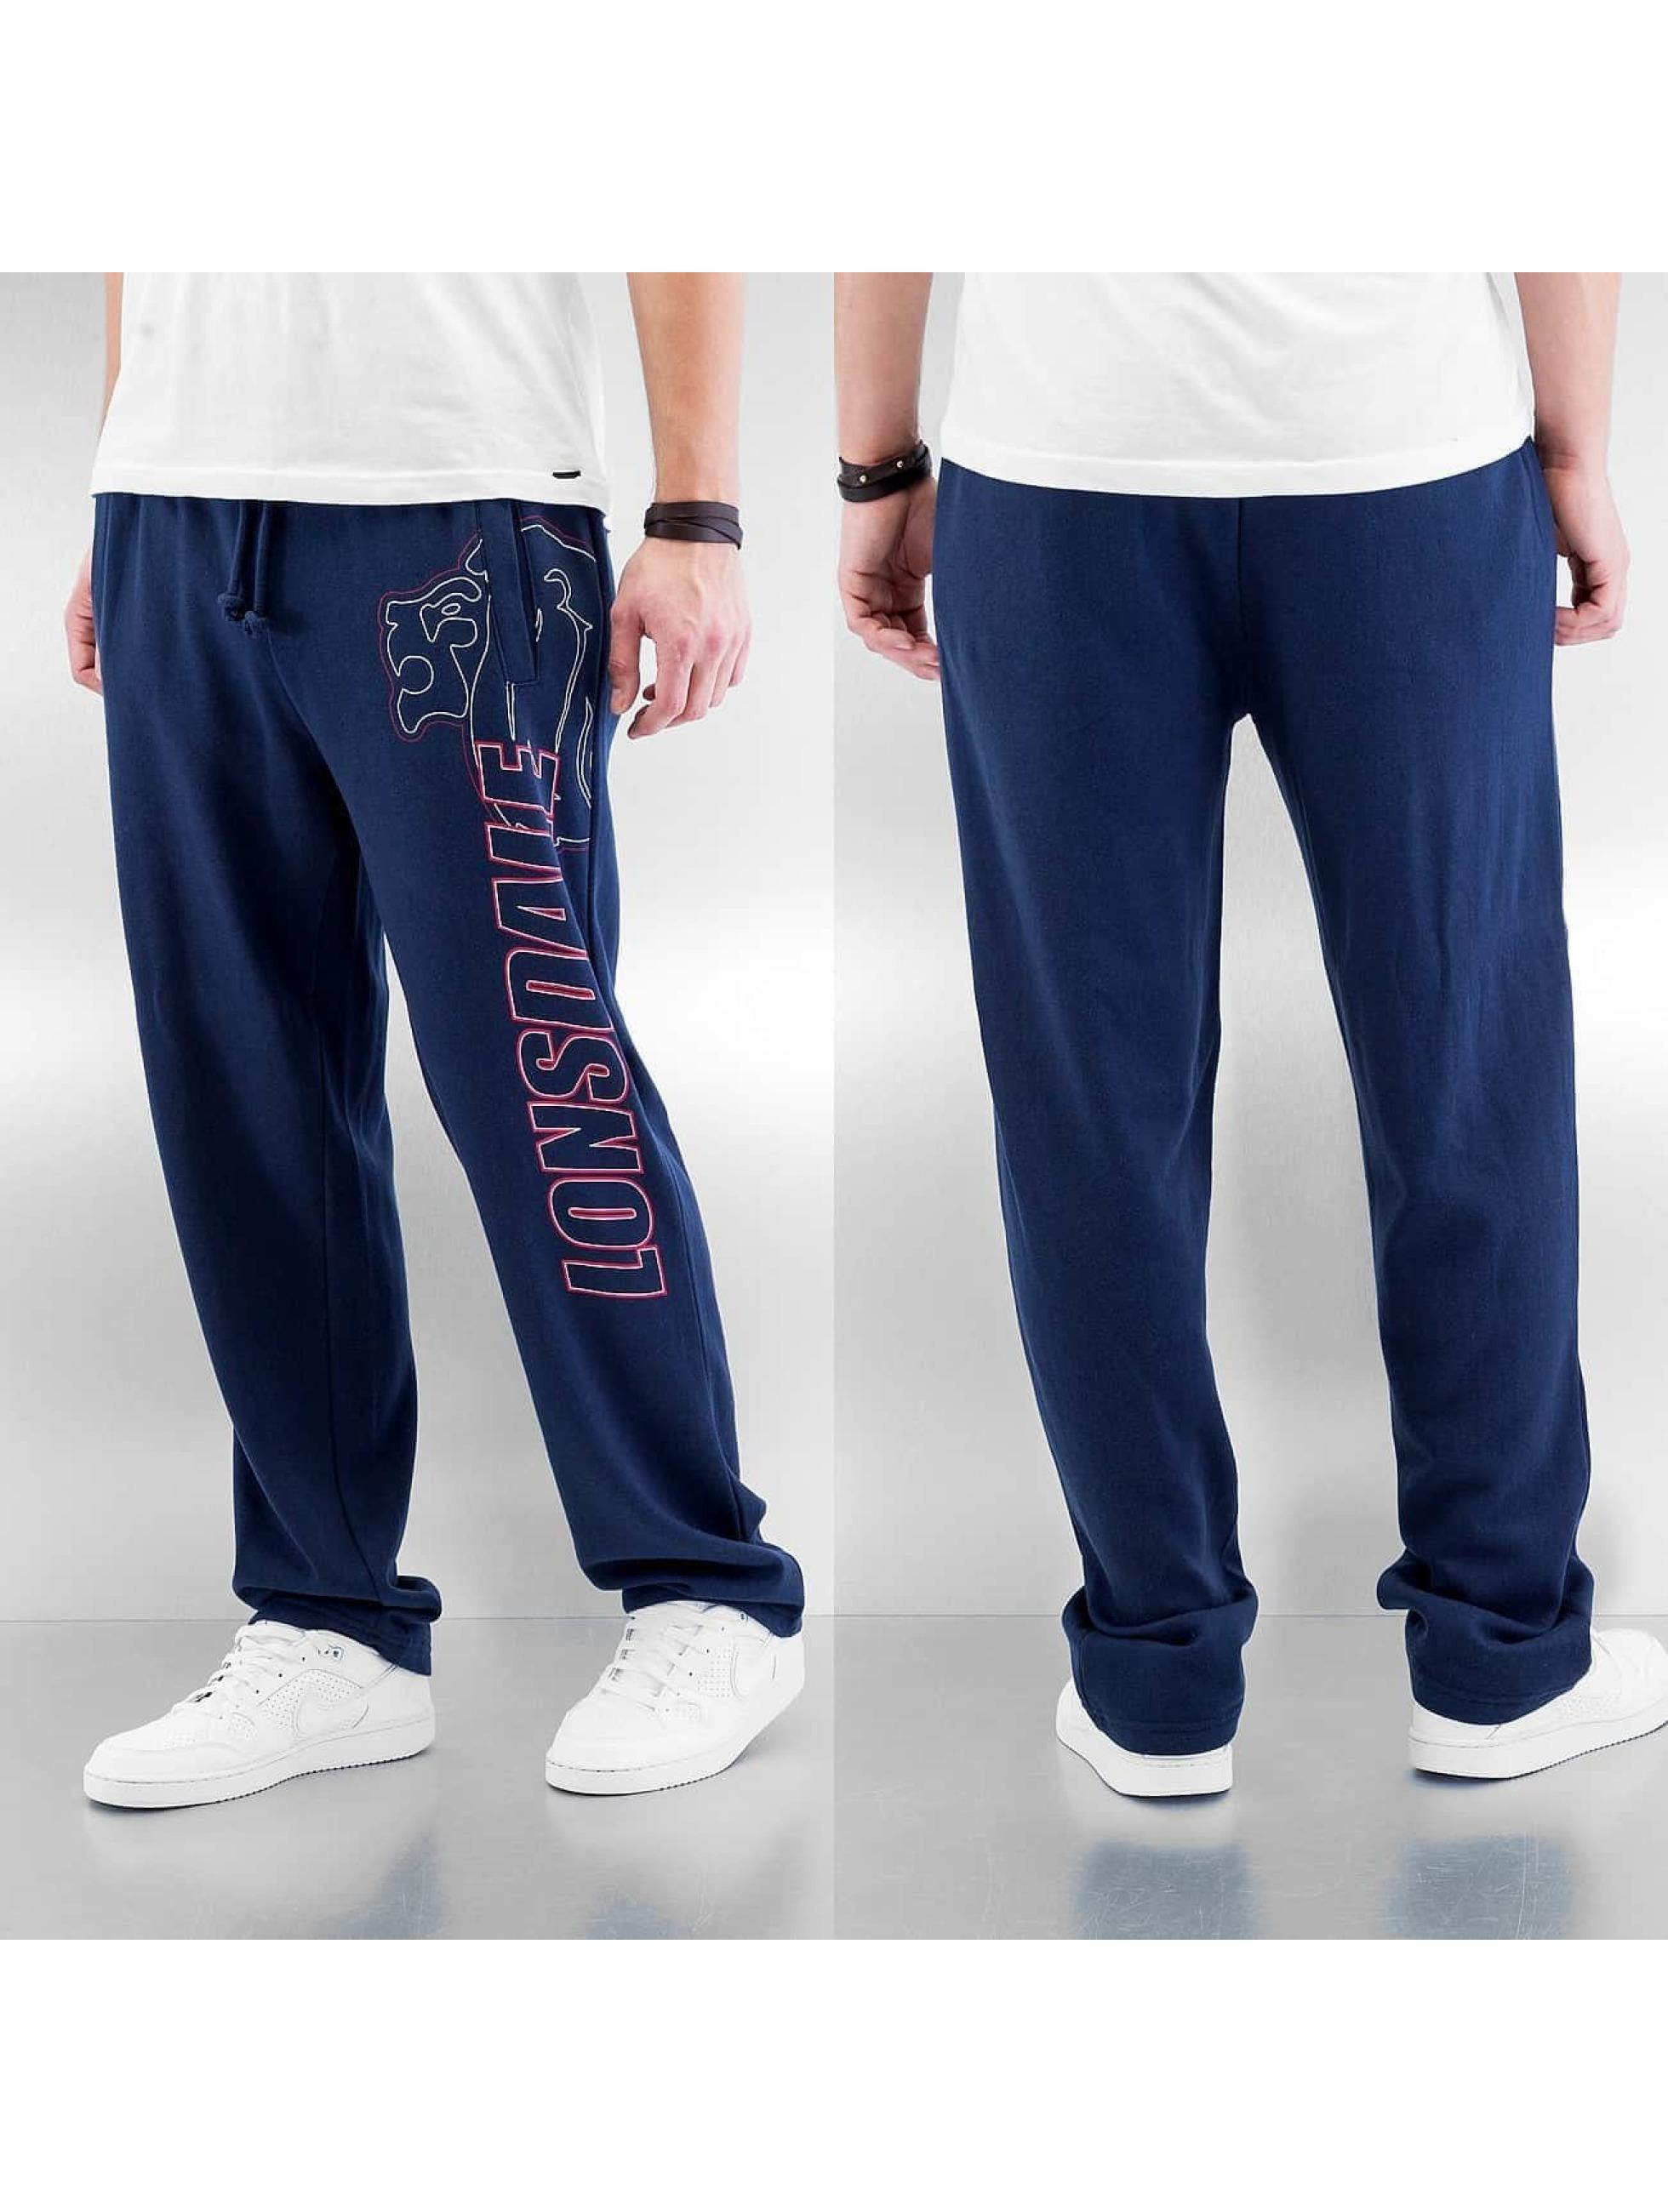 Lonsdale London Спортивные брюки Ducklington синий